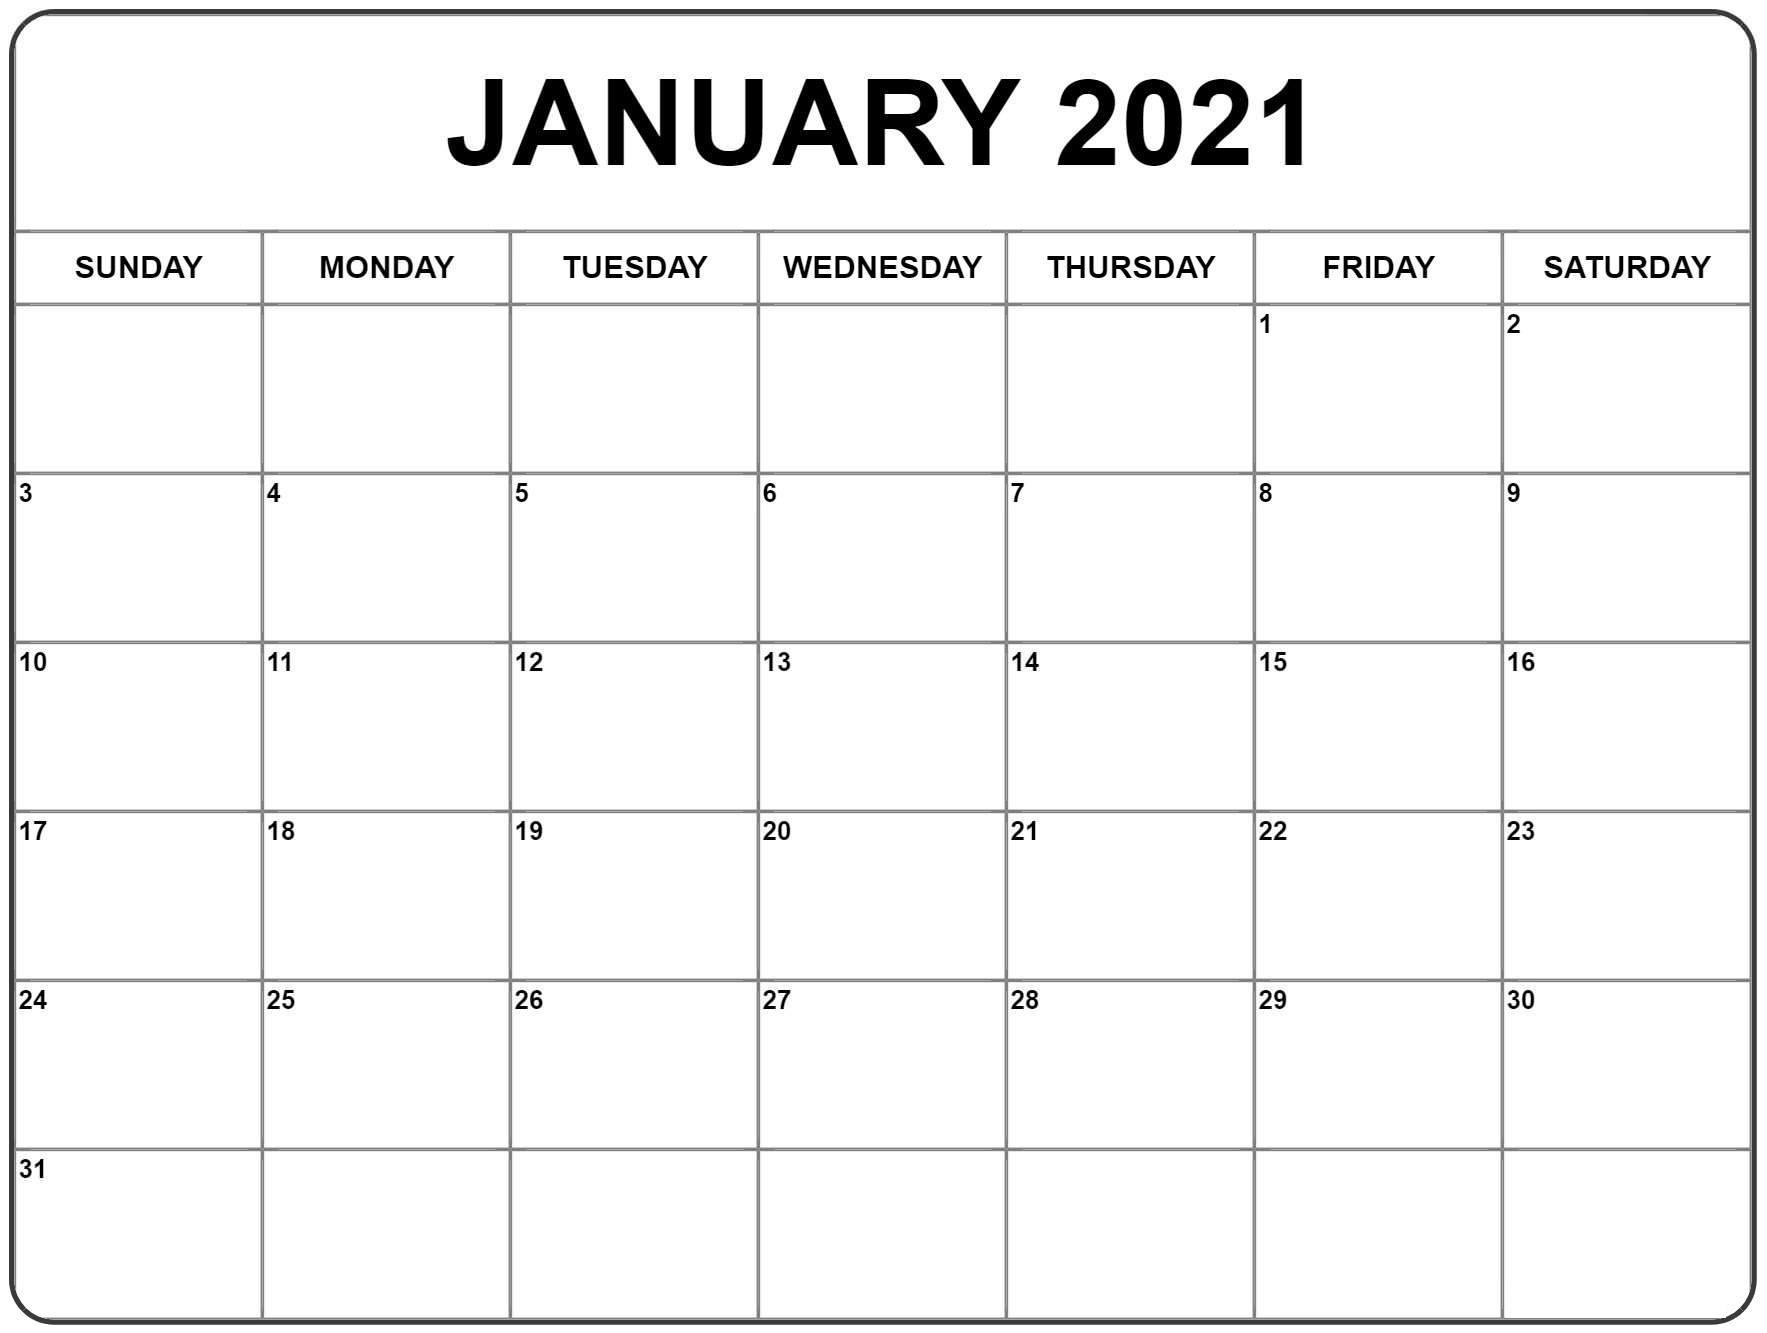 June 2021 Calendar Word Doc | Calendar Template Printable June 2021 Calendar In Excel